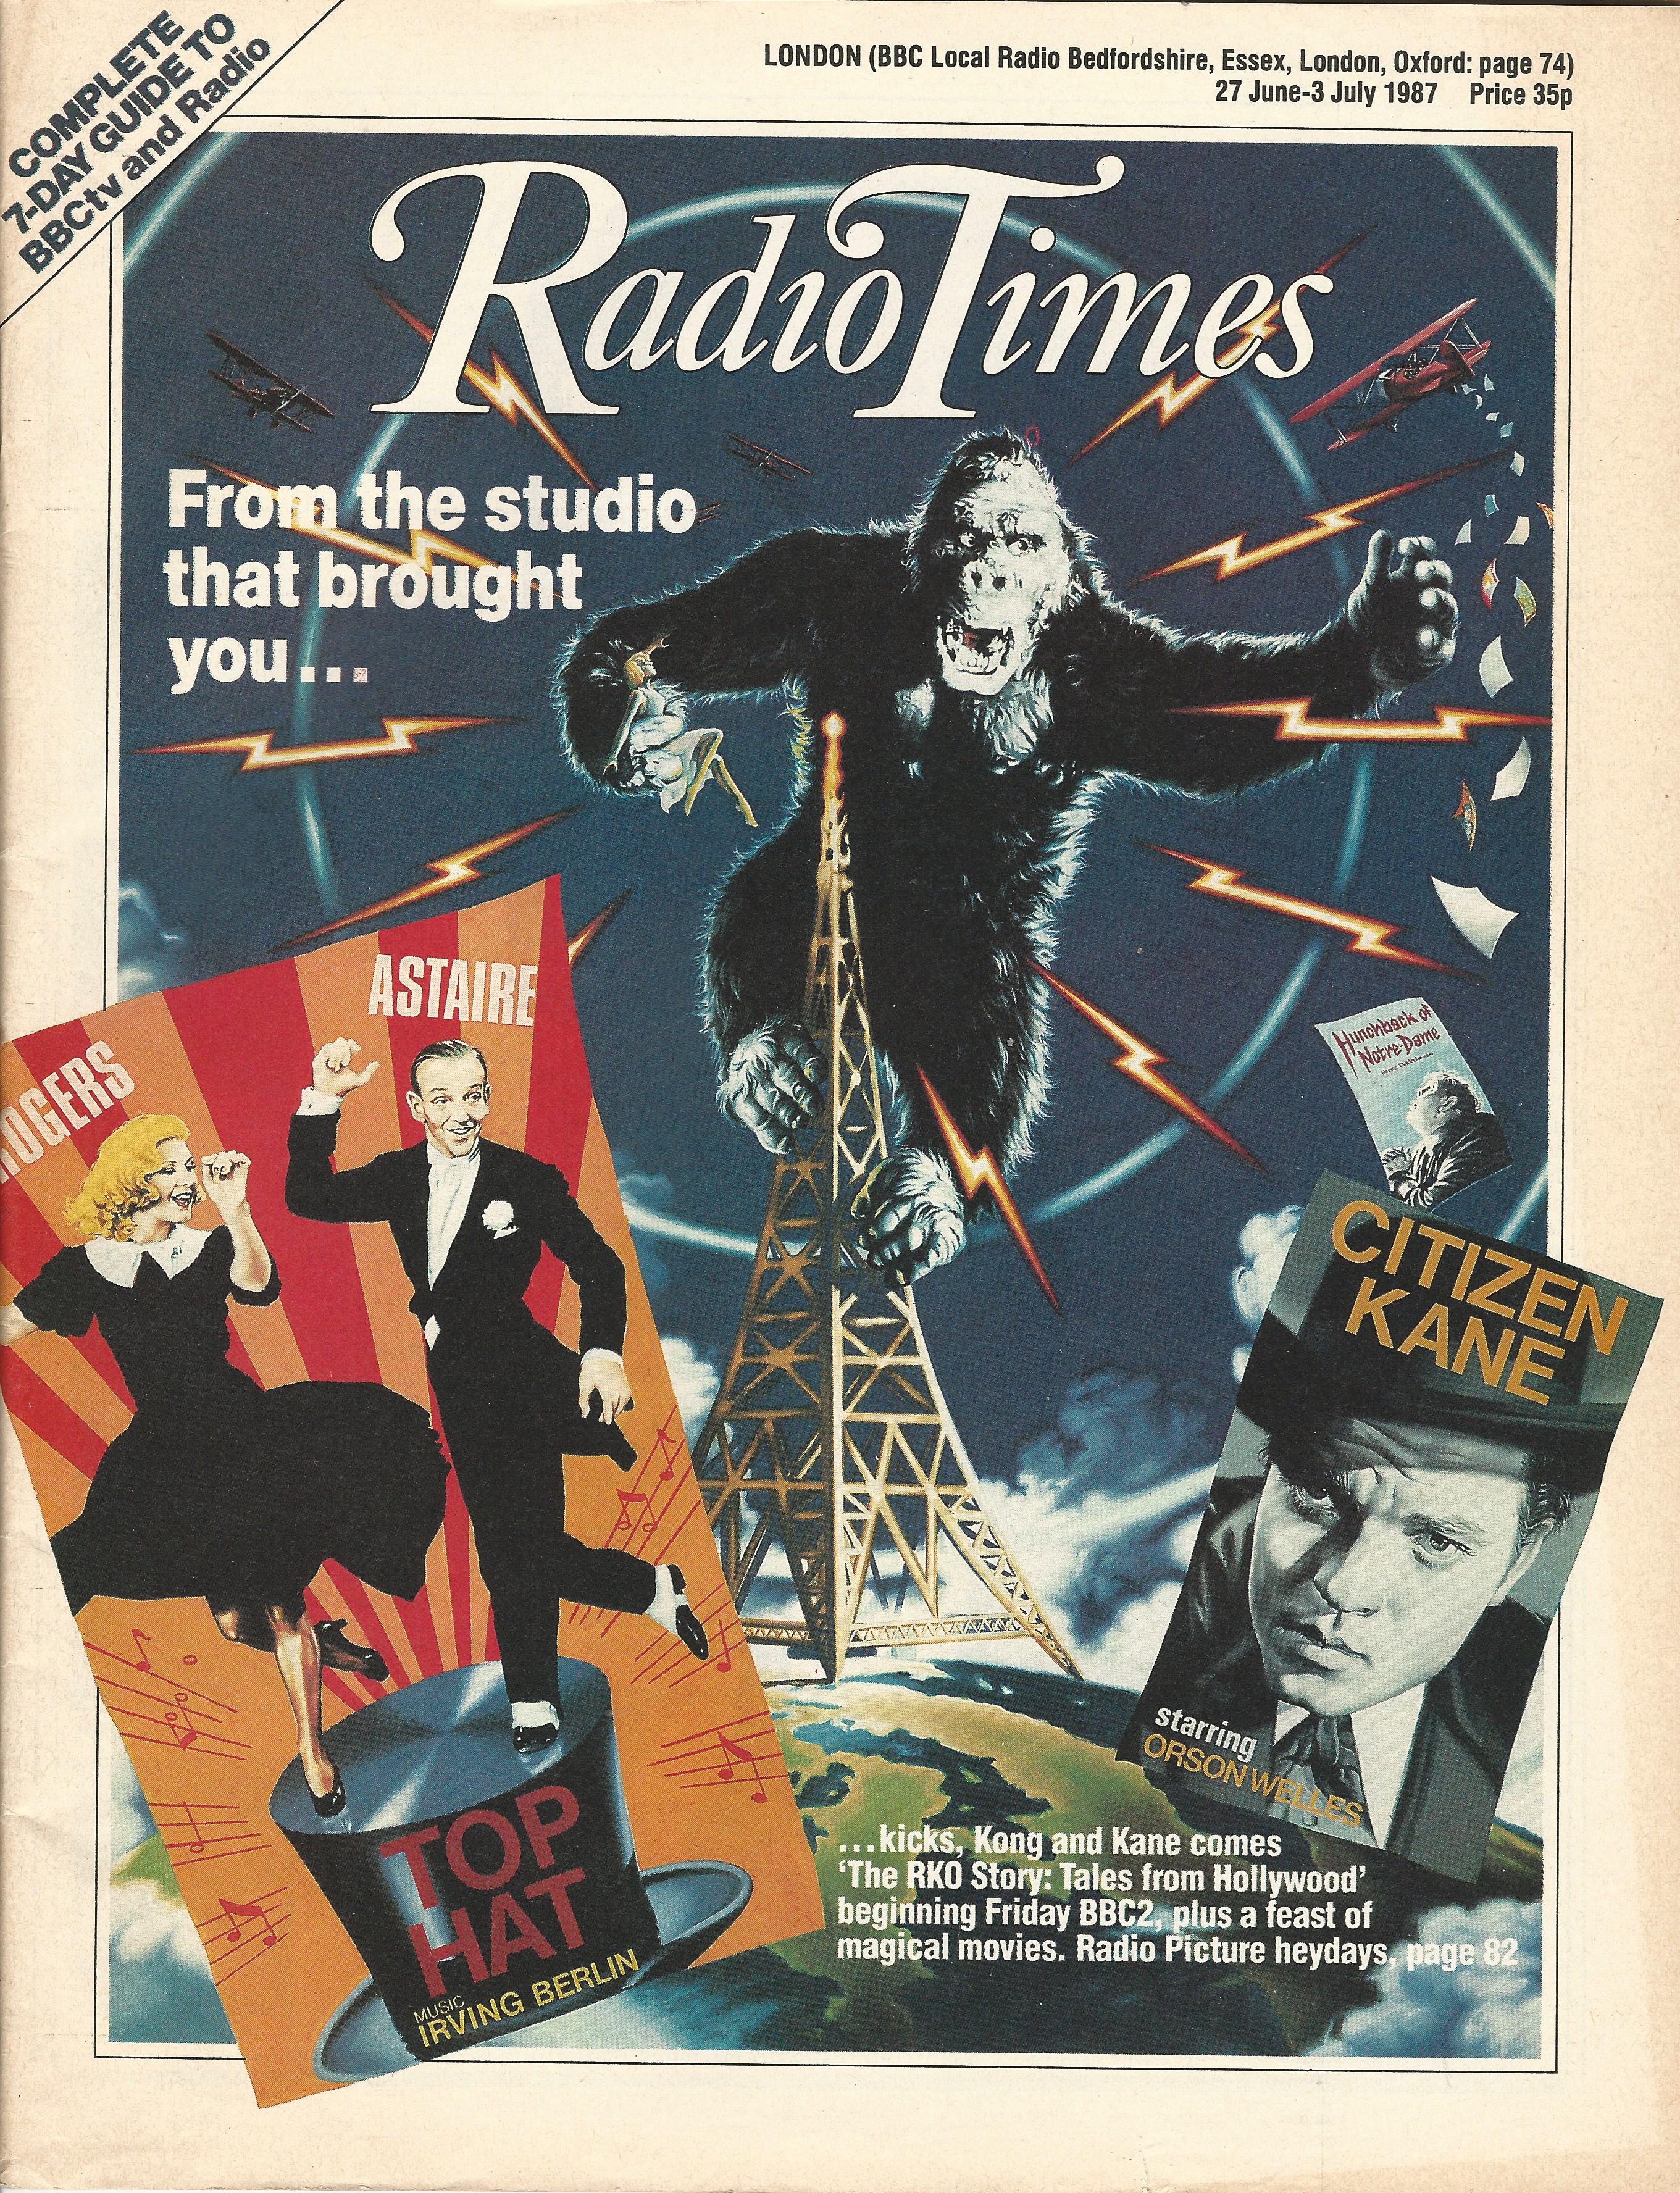 RKO Story Radio Times